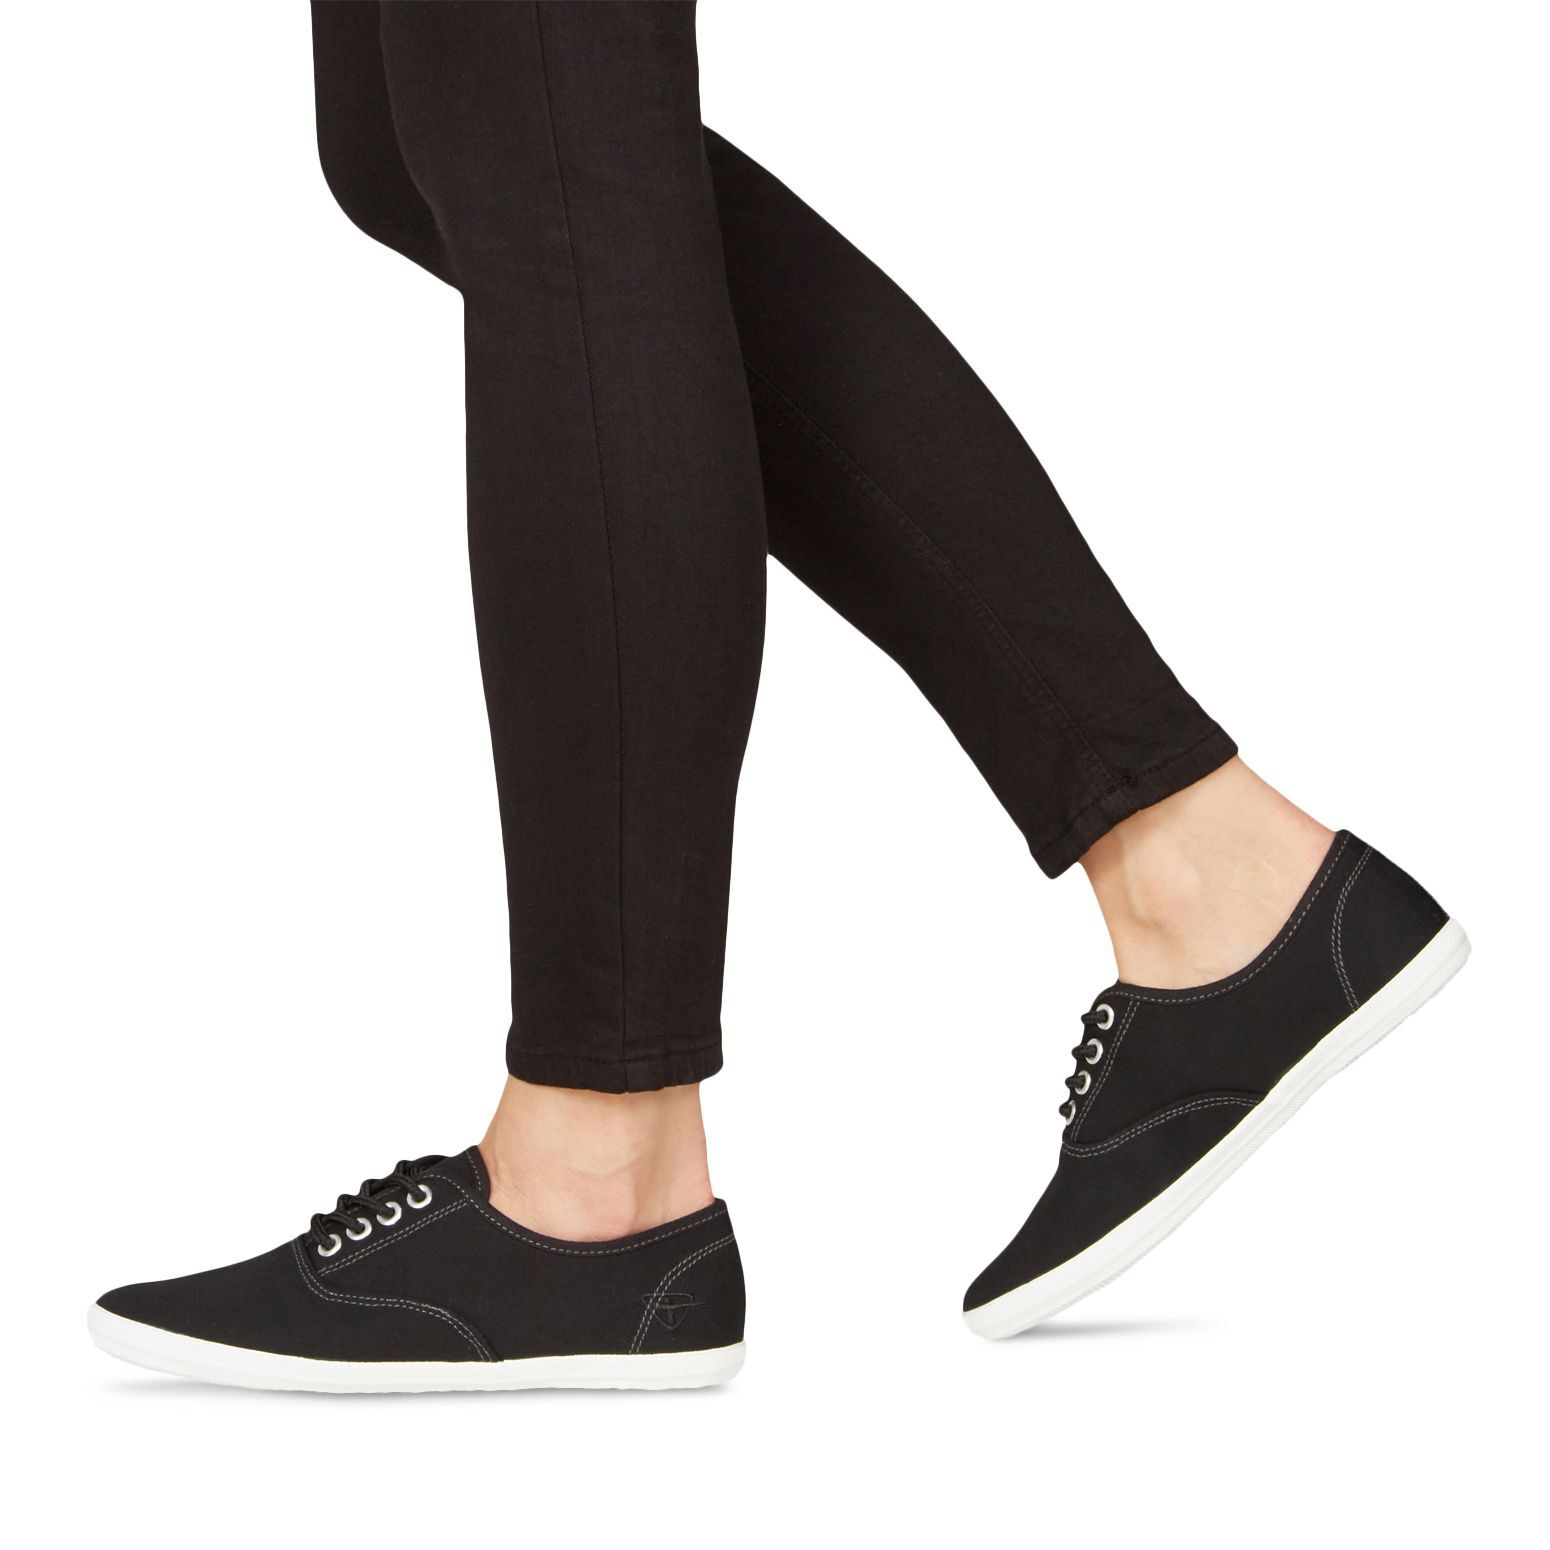 Tamaris 23609 Femmes Chaussures De Sport - Blanc (blanc 100), Maat: 39